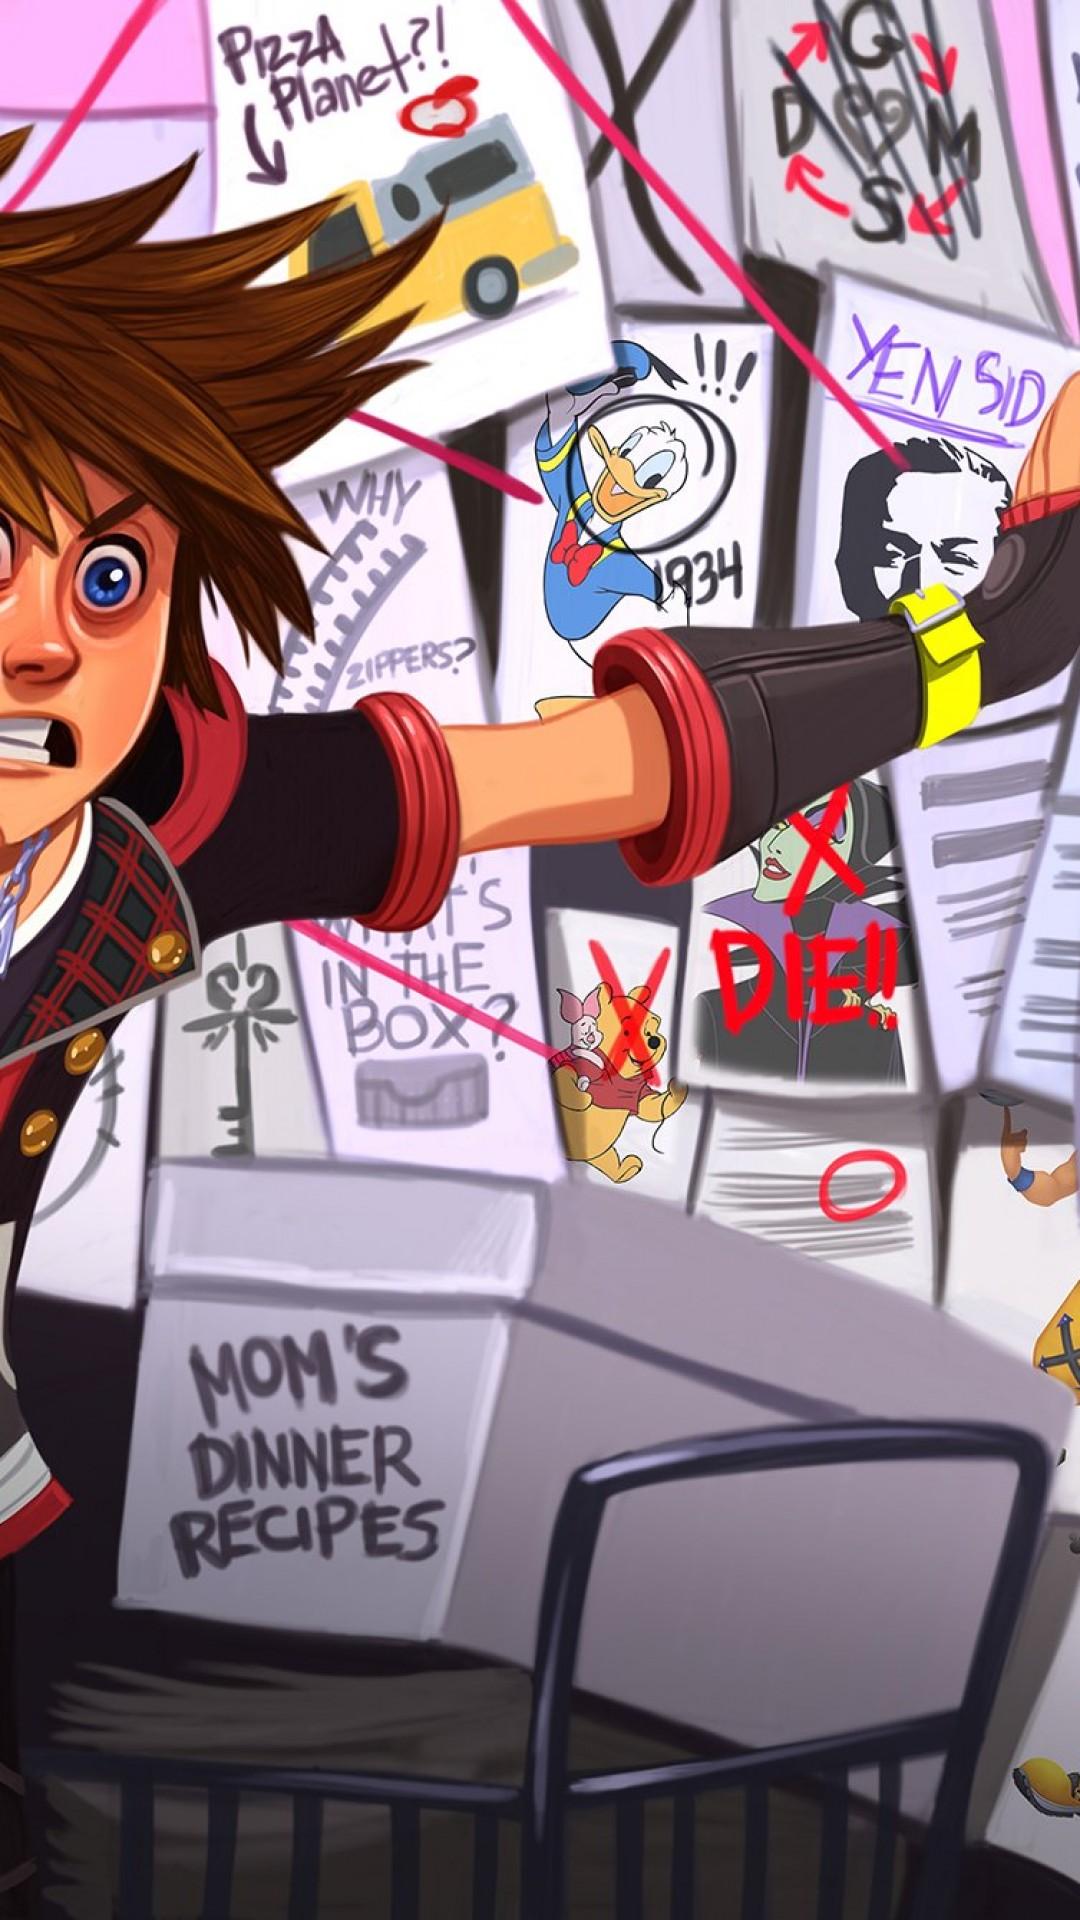 Iphone 8 Plus Kingdom Hearts 3 Wallpaper Kingdom Hearts Lore Meme 1080x1920 Wallpaper Teahub Io